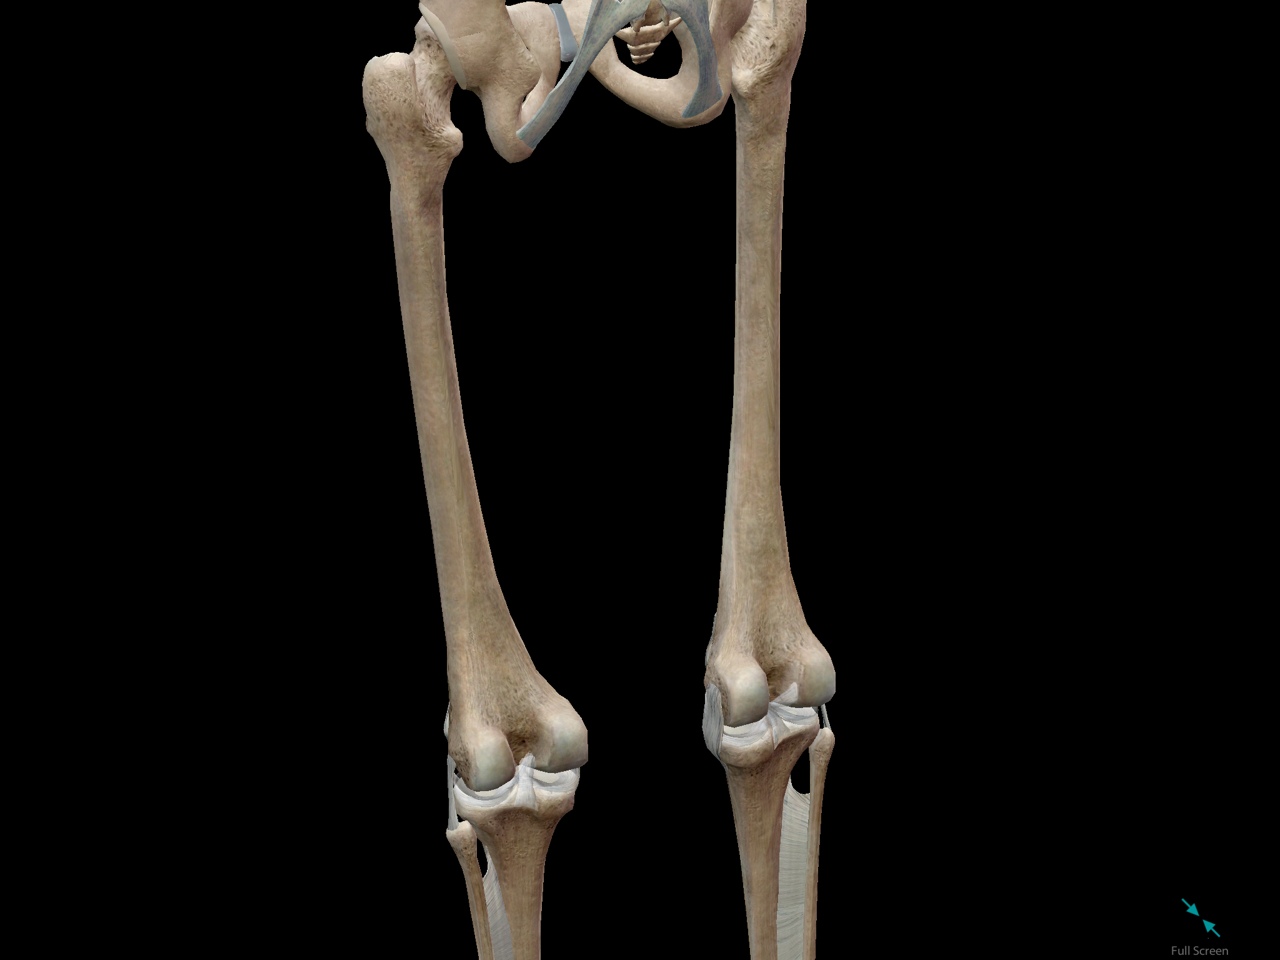 femur-bone-long-compact-osteon-marrow-popliteal.png